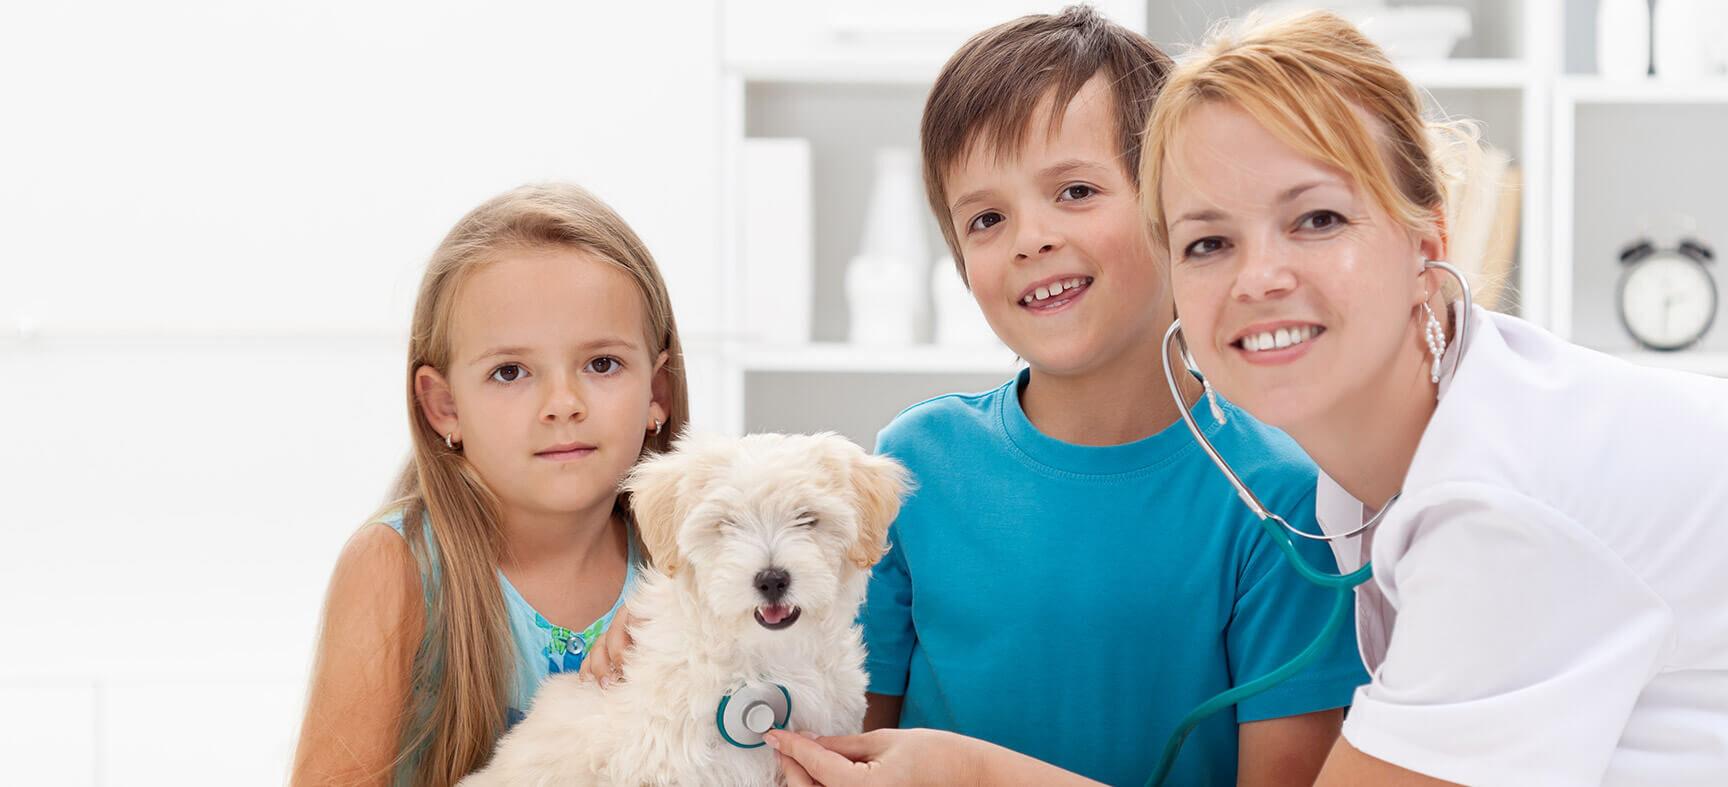 Childhood Illnesses: Pinkeye